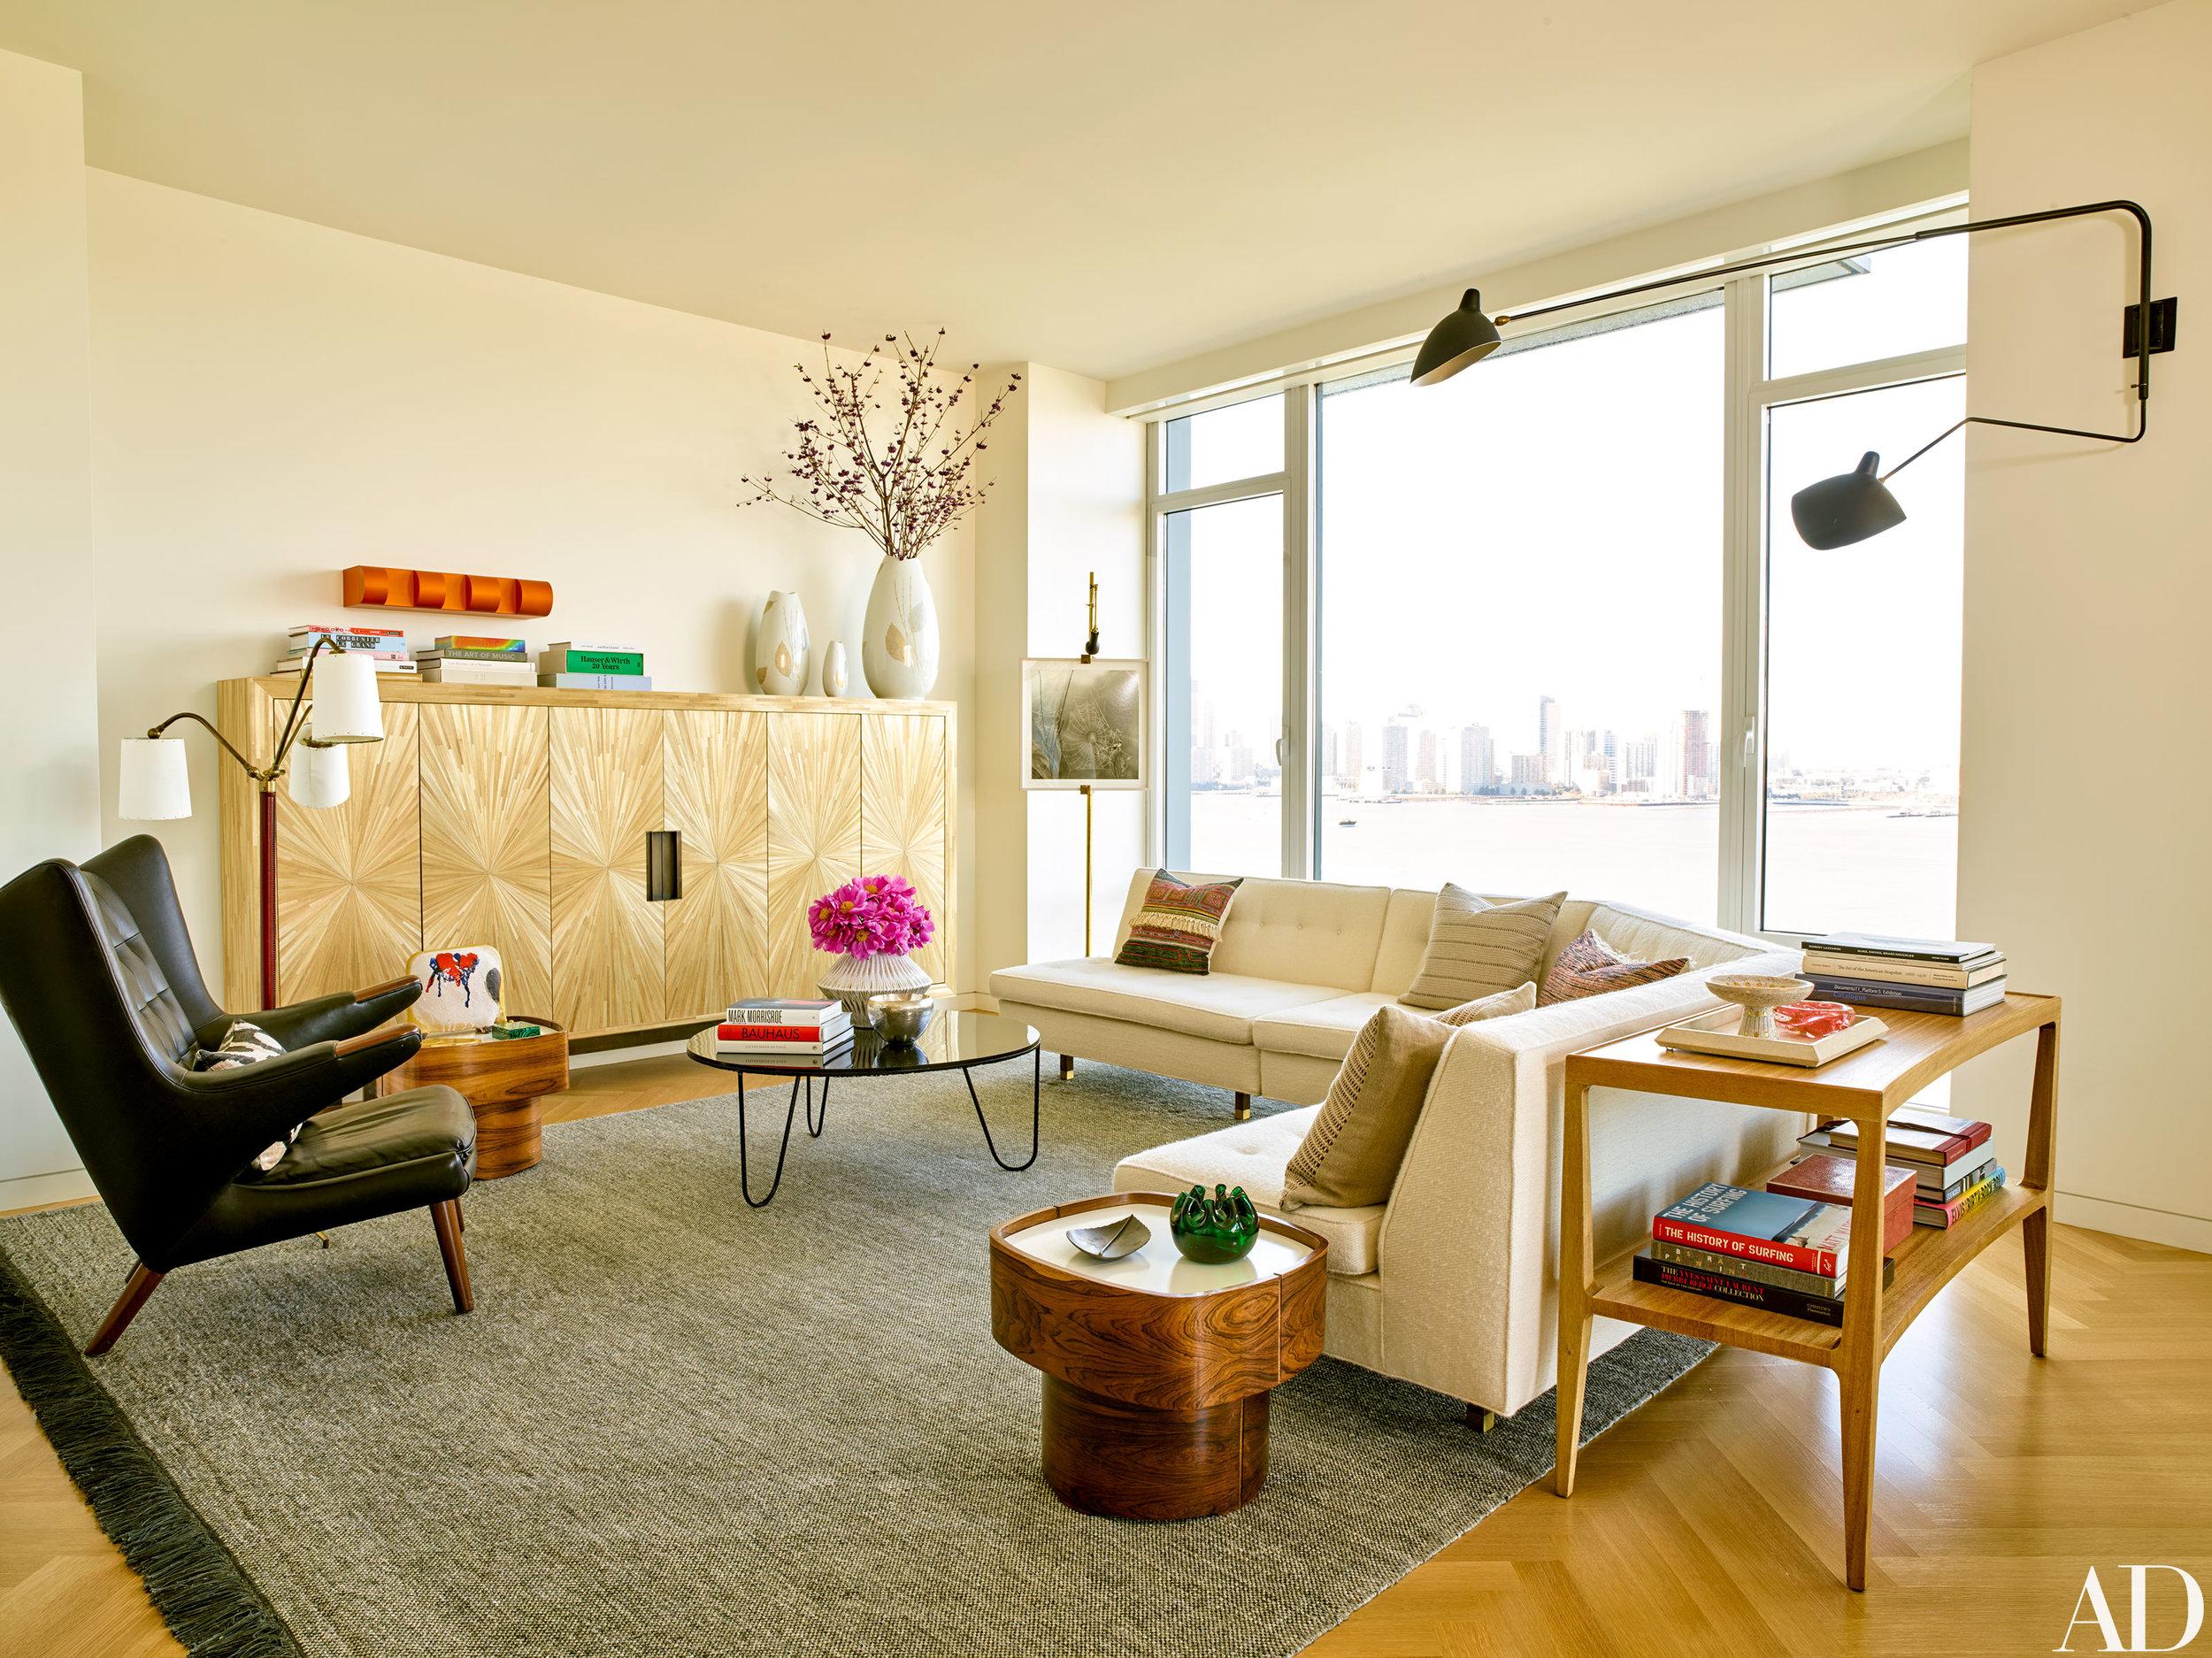 jimmie-johnson-new-york-city-apartment-0217-8.jpg